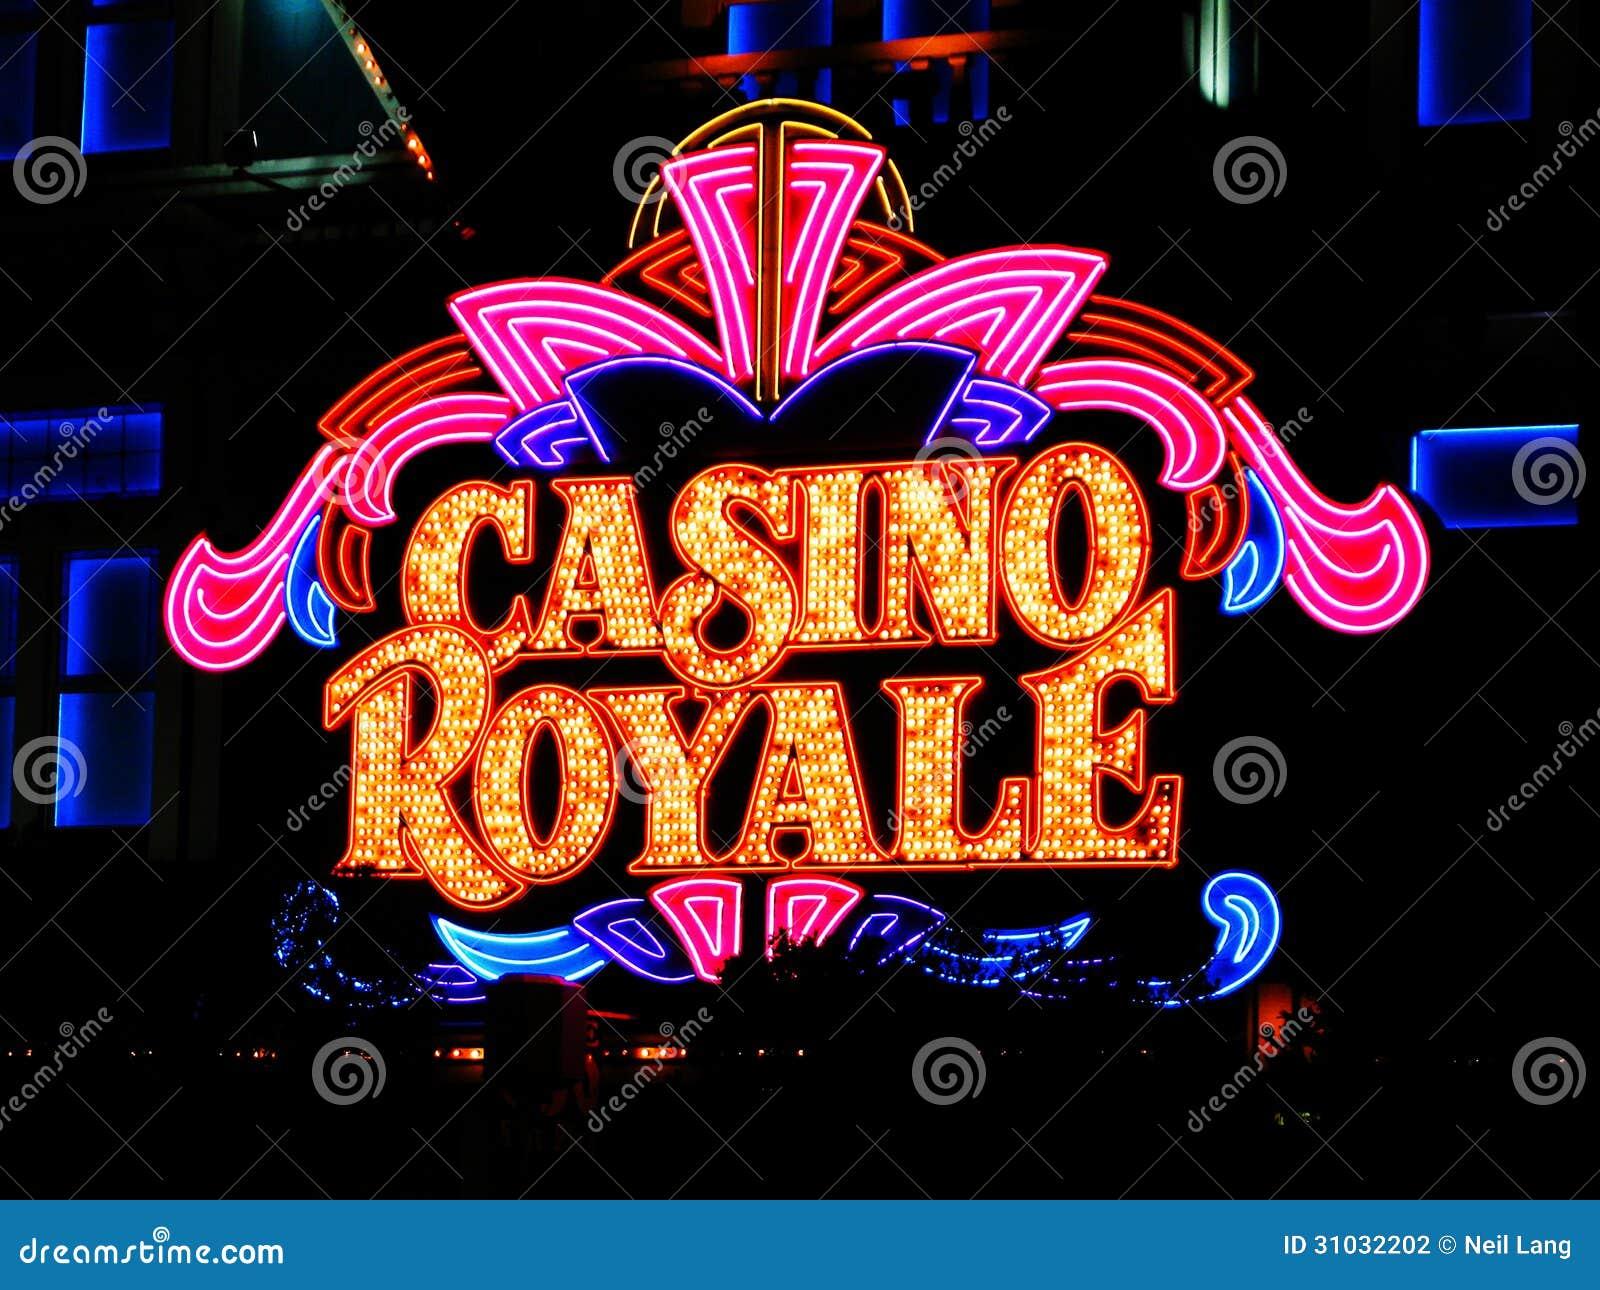 LAS VEGAS NV - JUNE 05 Hotel Casino Royale on June 27, 2005